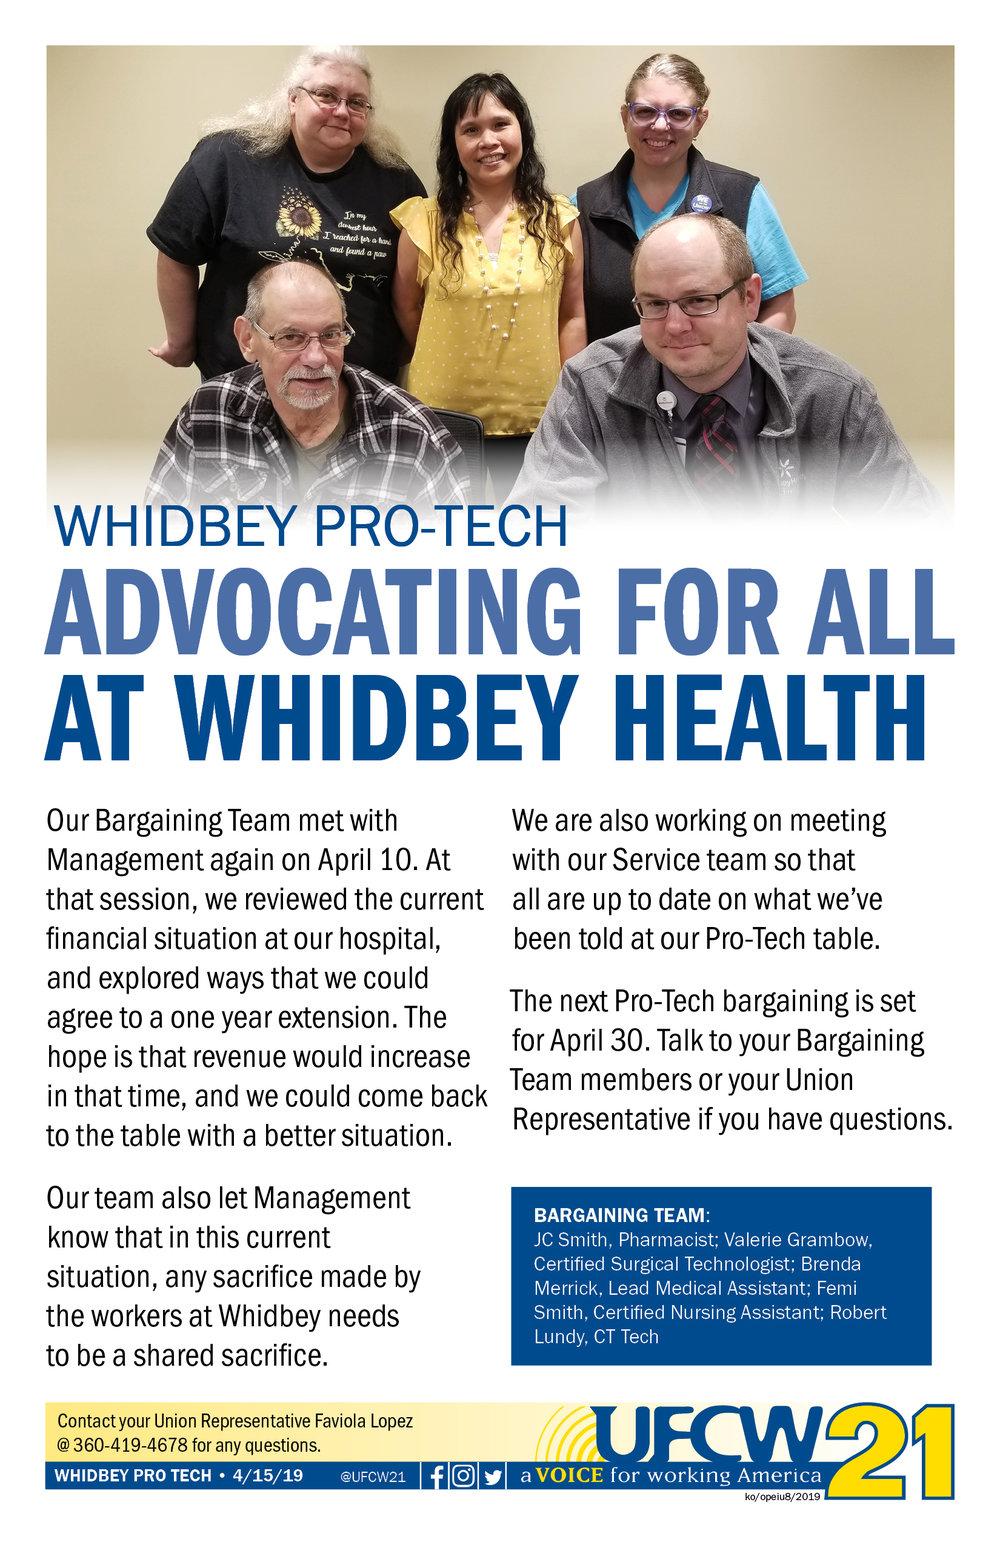 2019 0415 - Whidbey Pro Tech.jpg